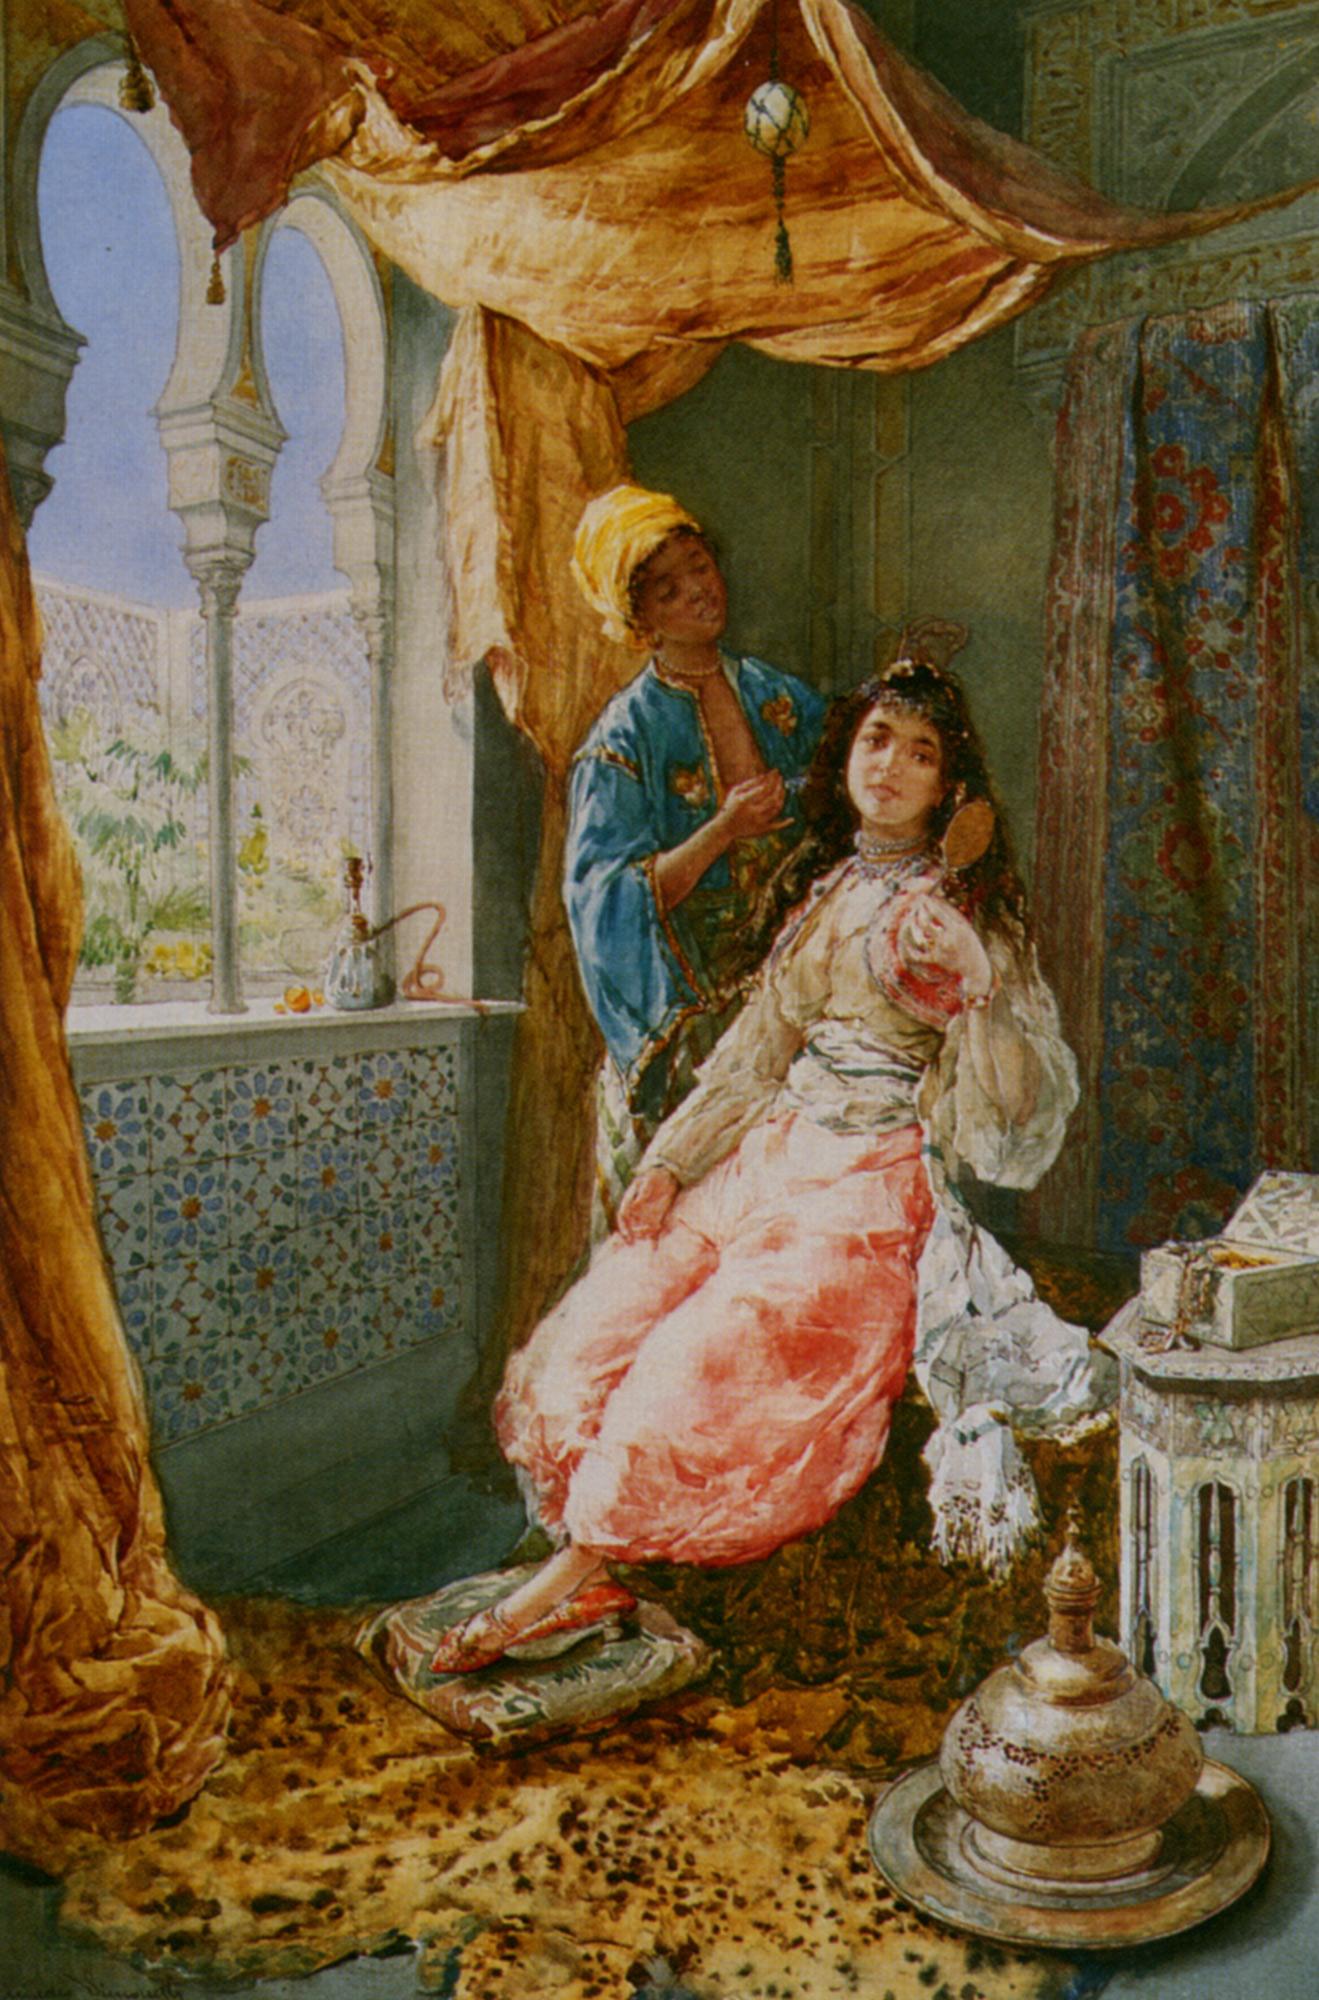 Attending the Princes :: Amedeo Momo Simonetti - Arab women (Harem Life scenes) in art  and painting ôîòî